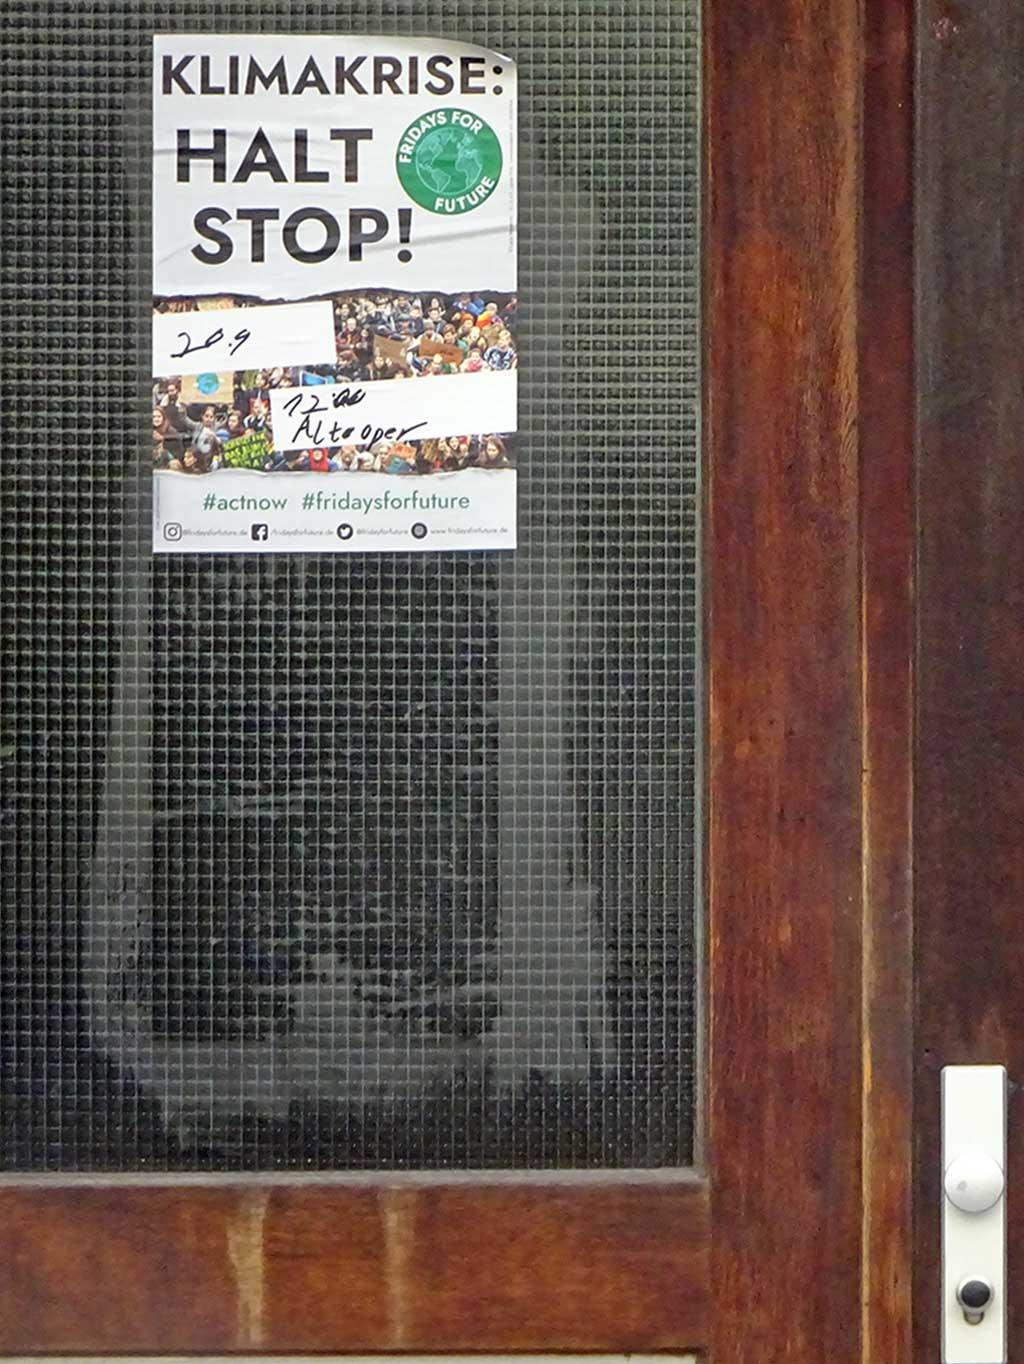 Klimakrise: Halt Stop! #actnow